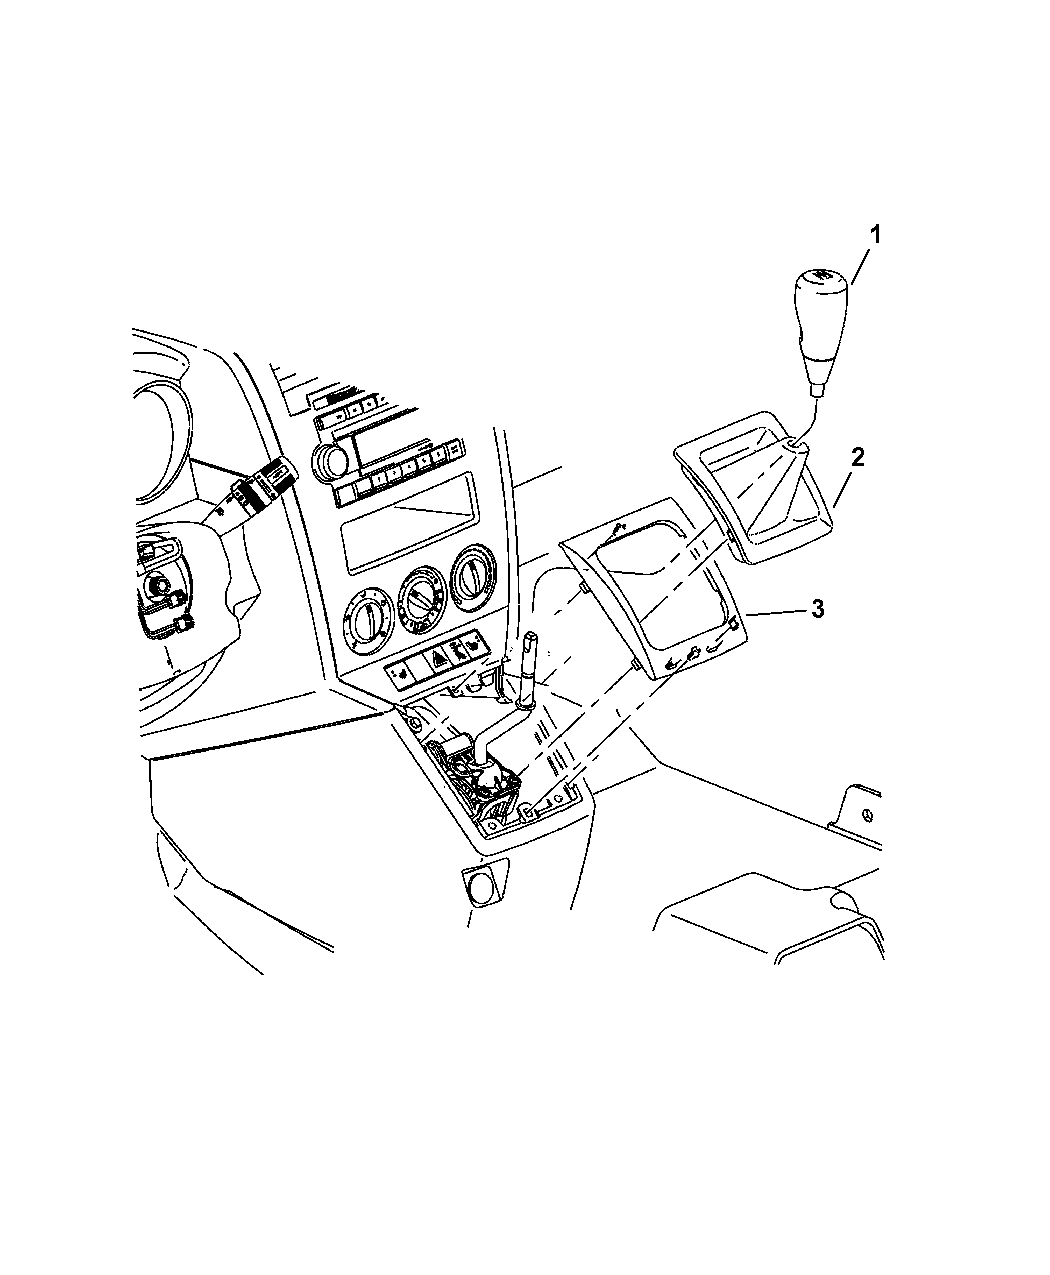 2007 dodge caliber shift knob  u0026 bezel